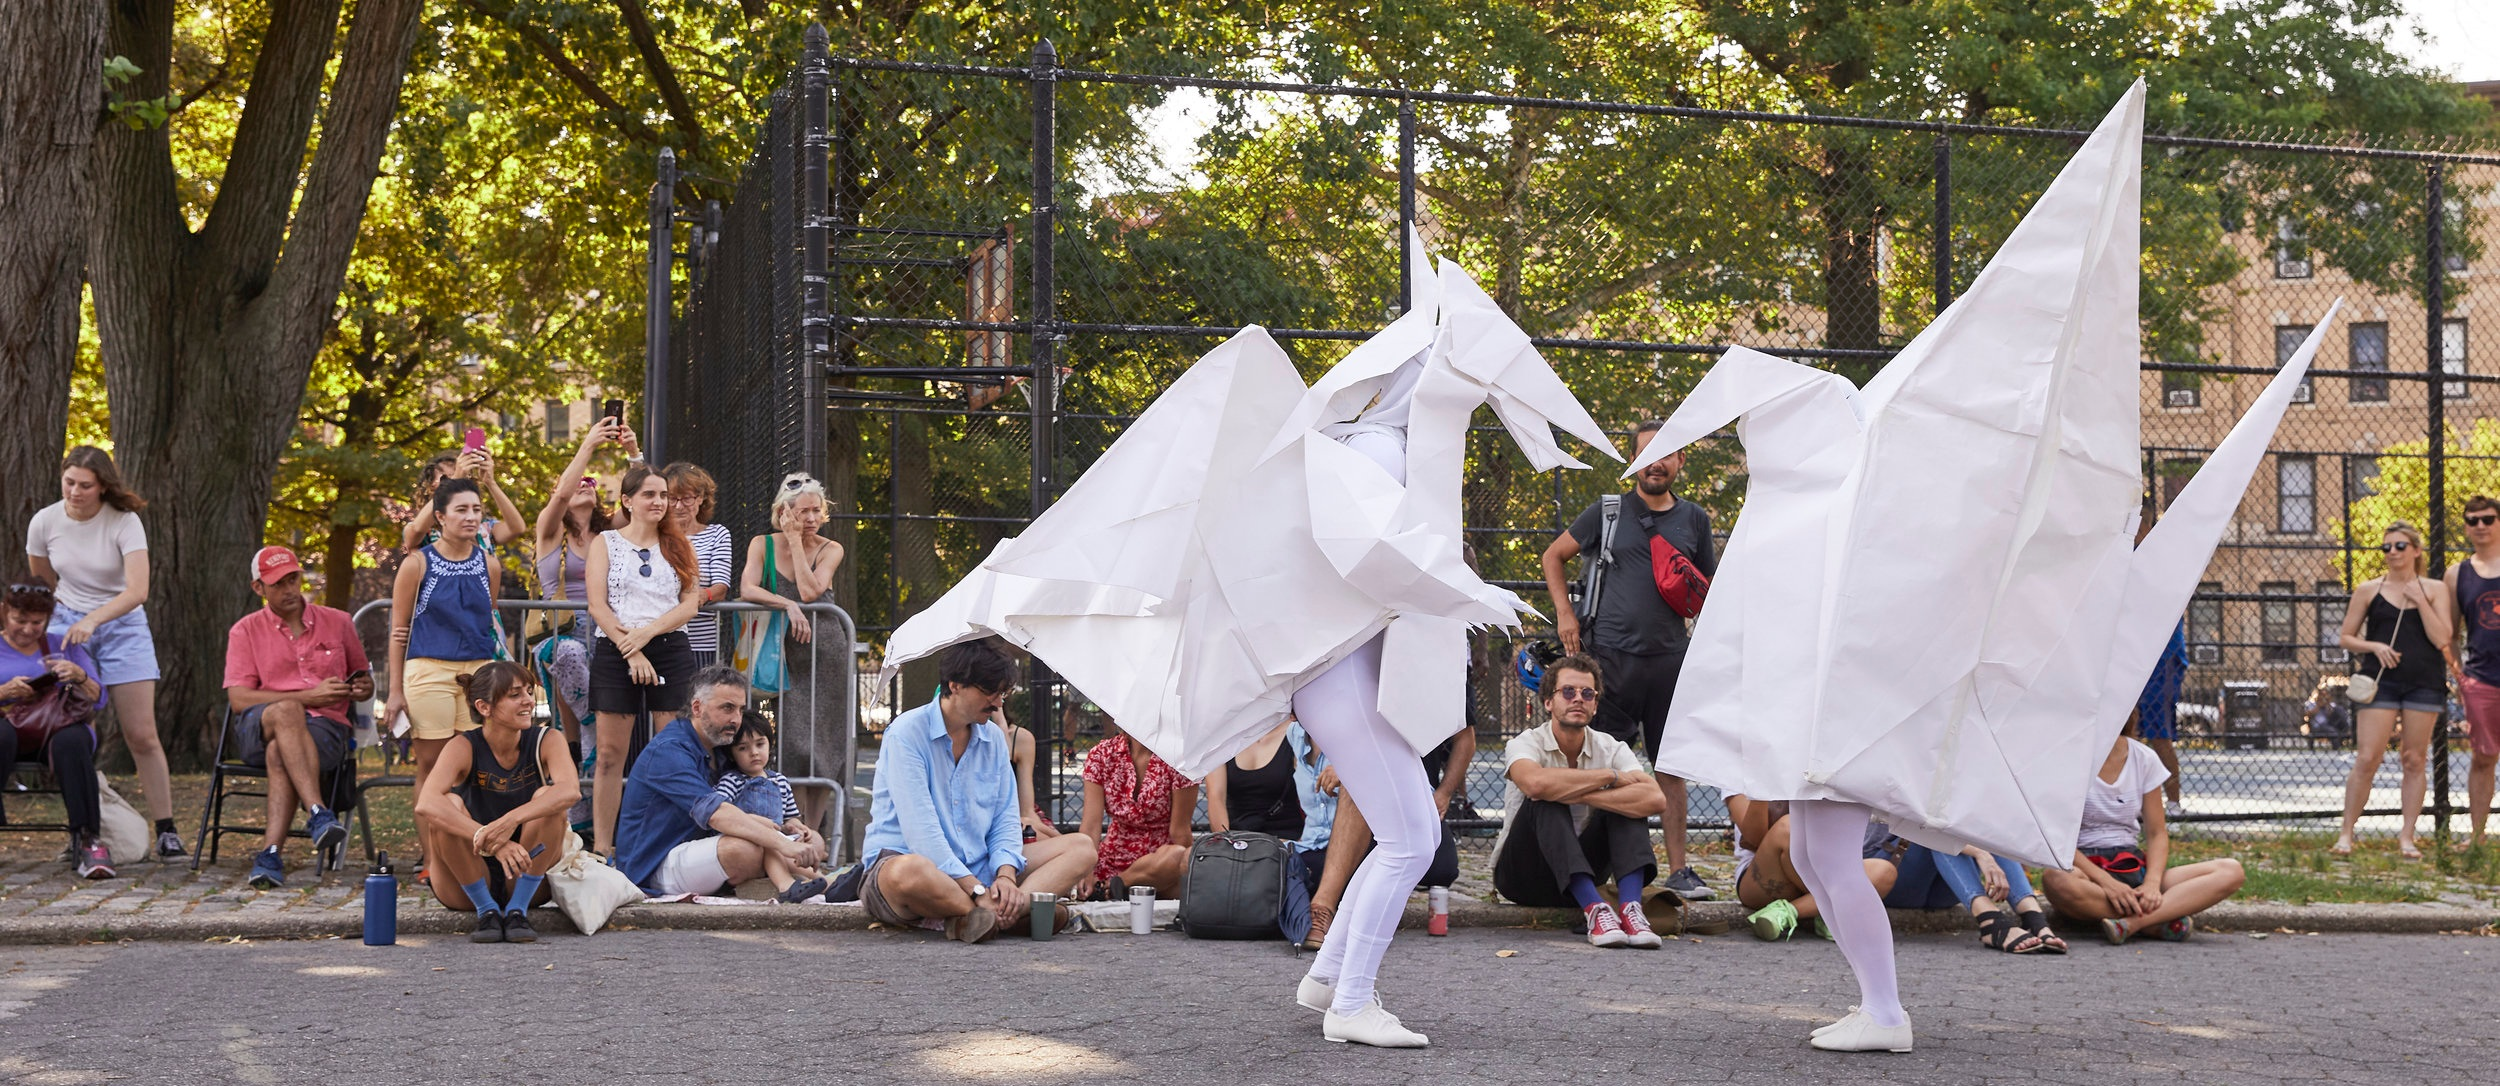 Origami Tango  de Sylvia Palacios Whitman (2019) • foto: Alison Luntz